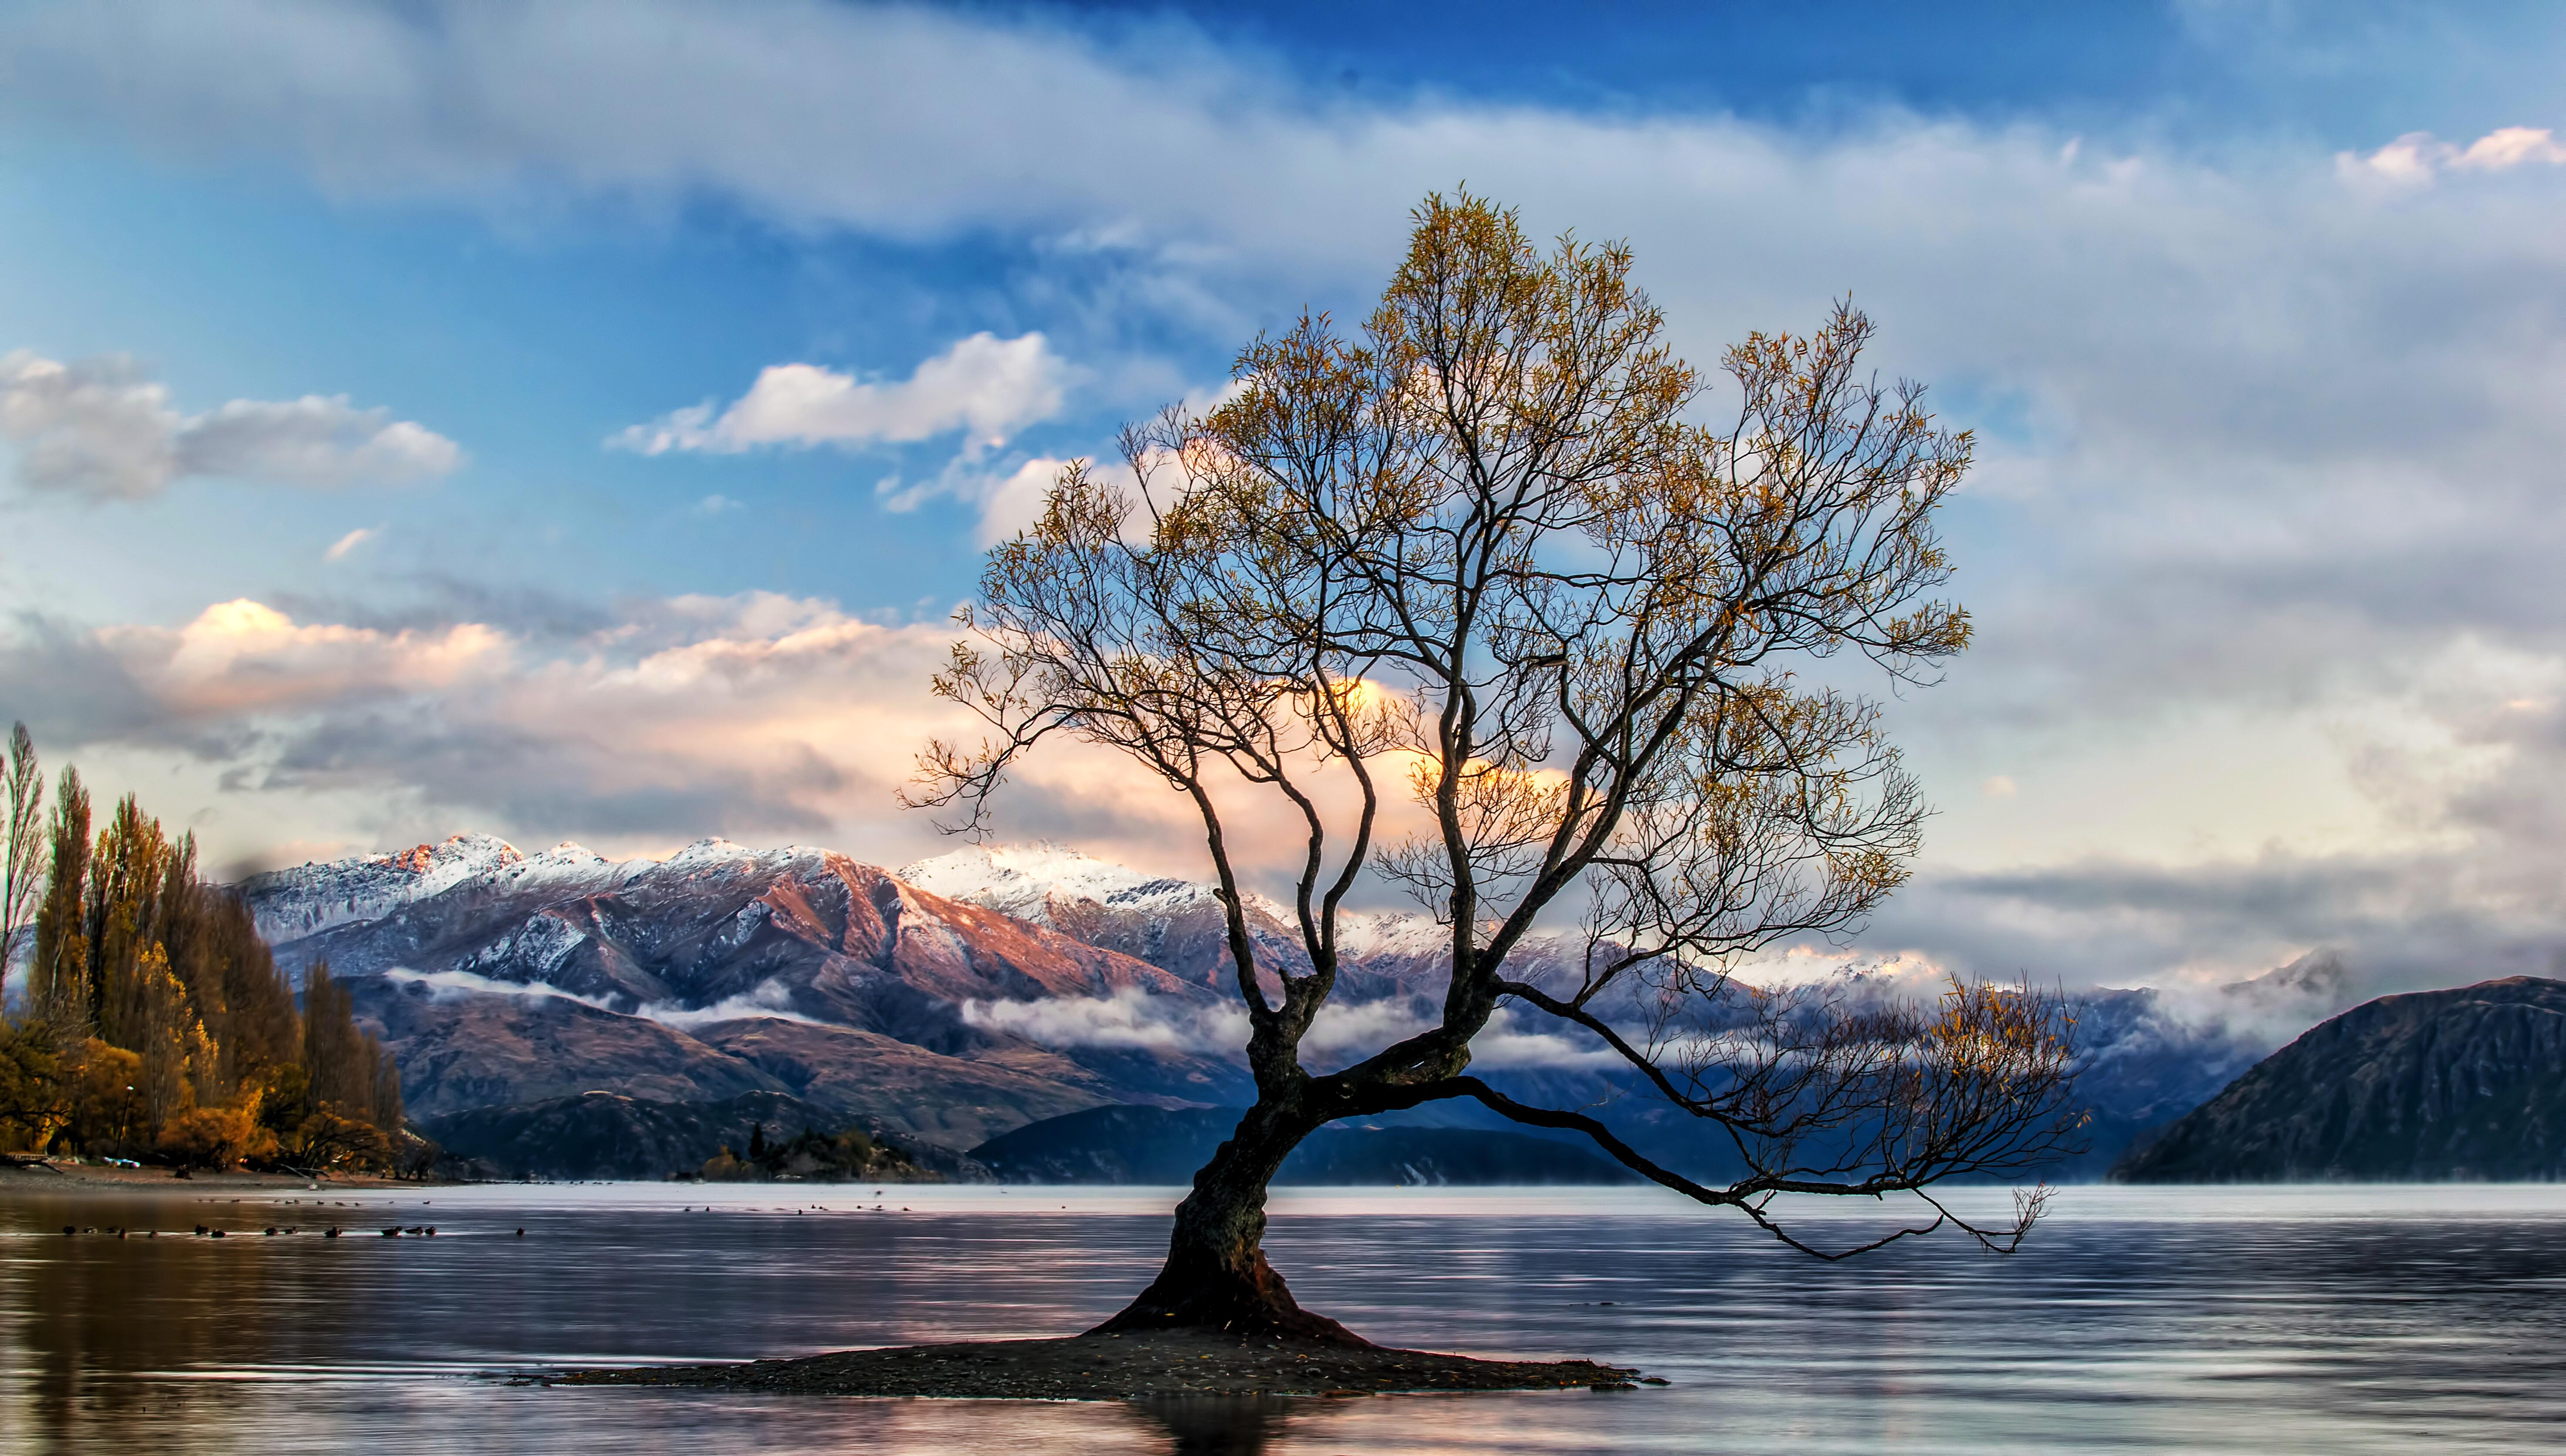 Hd Wallpaper - New Zealand Nature Hd , HD Wallpaper & Backgrounds